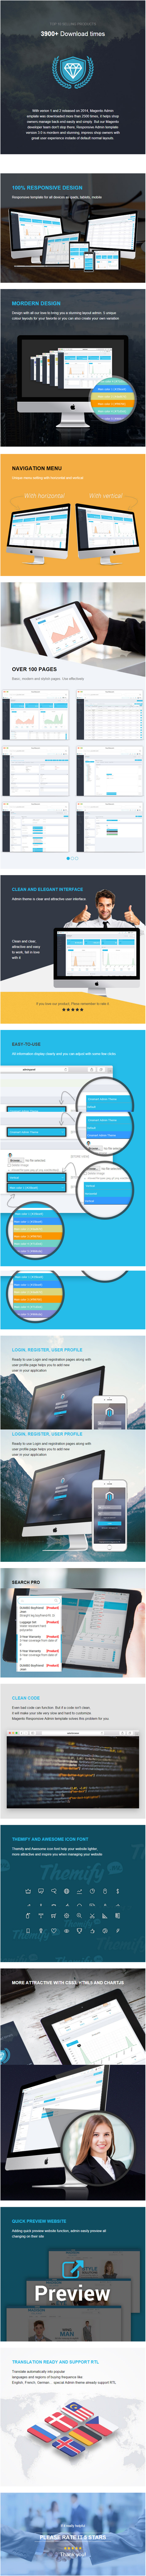 Magento Responsive Admin Template   Custom admin theme in Magento